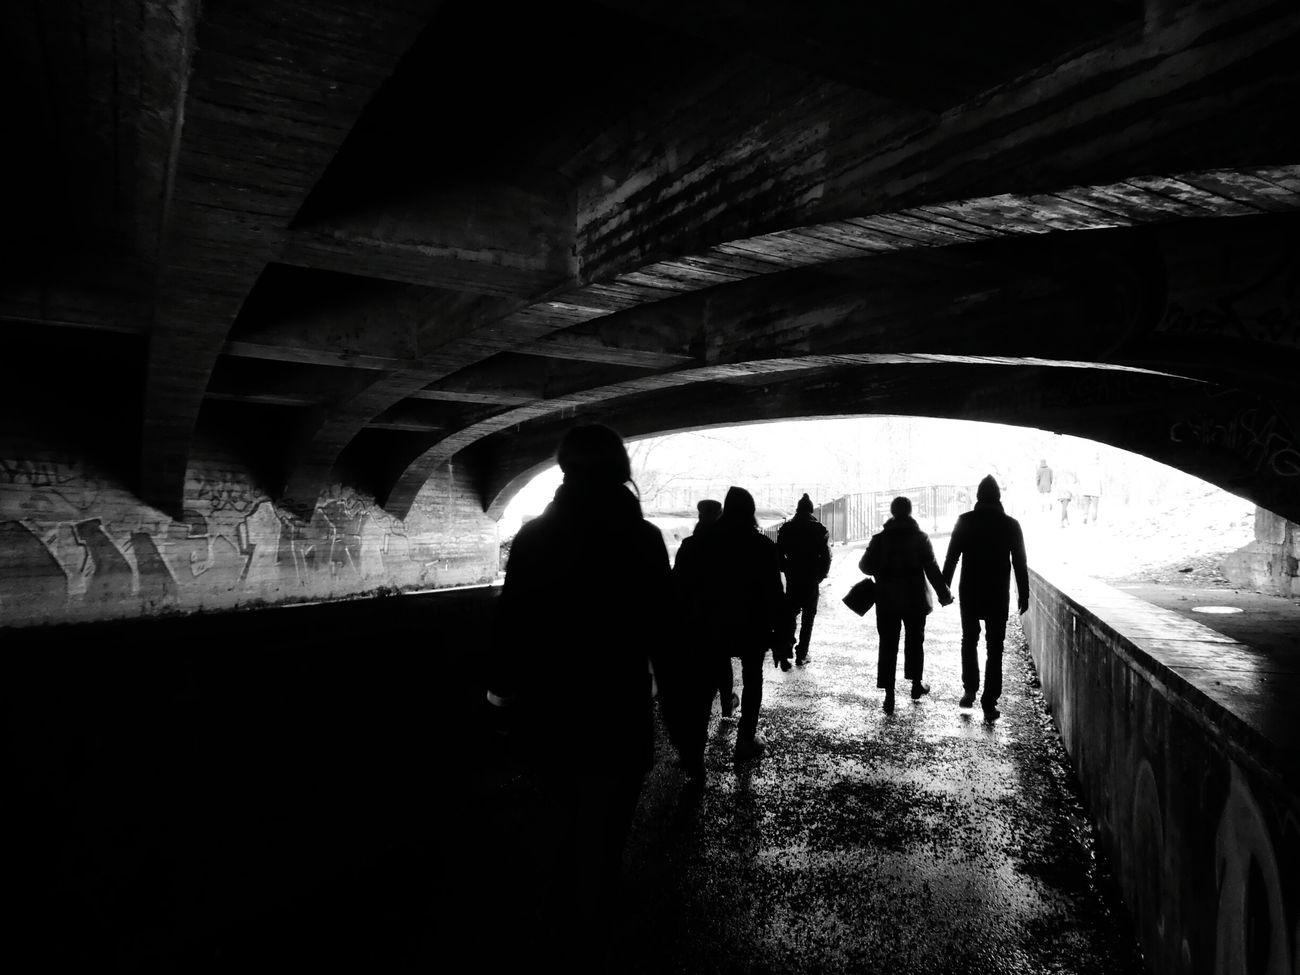 Into The Light Bridge People City Life Urban Lifestyle Walking Around Taking Pictures Akerselva Underthebridge Sundaywalk